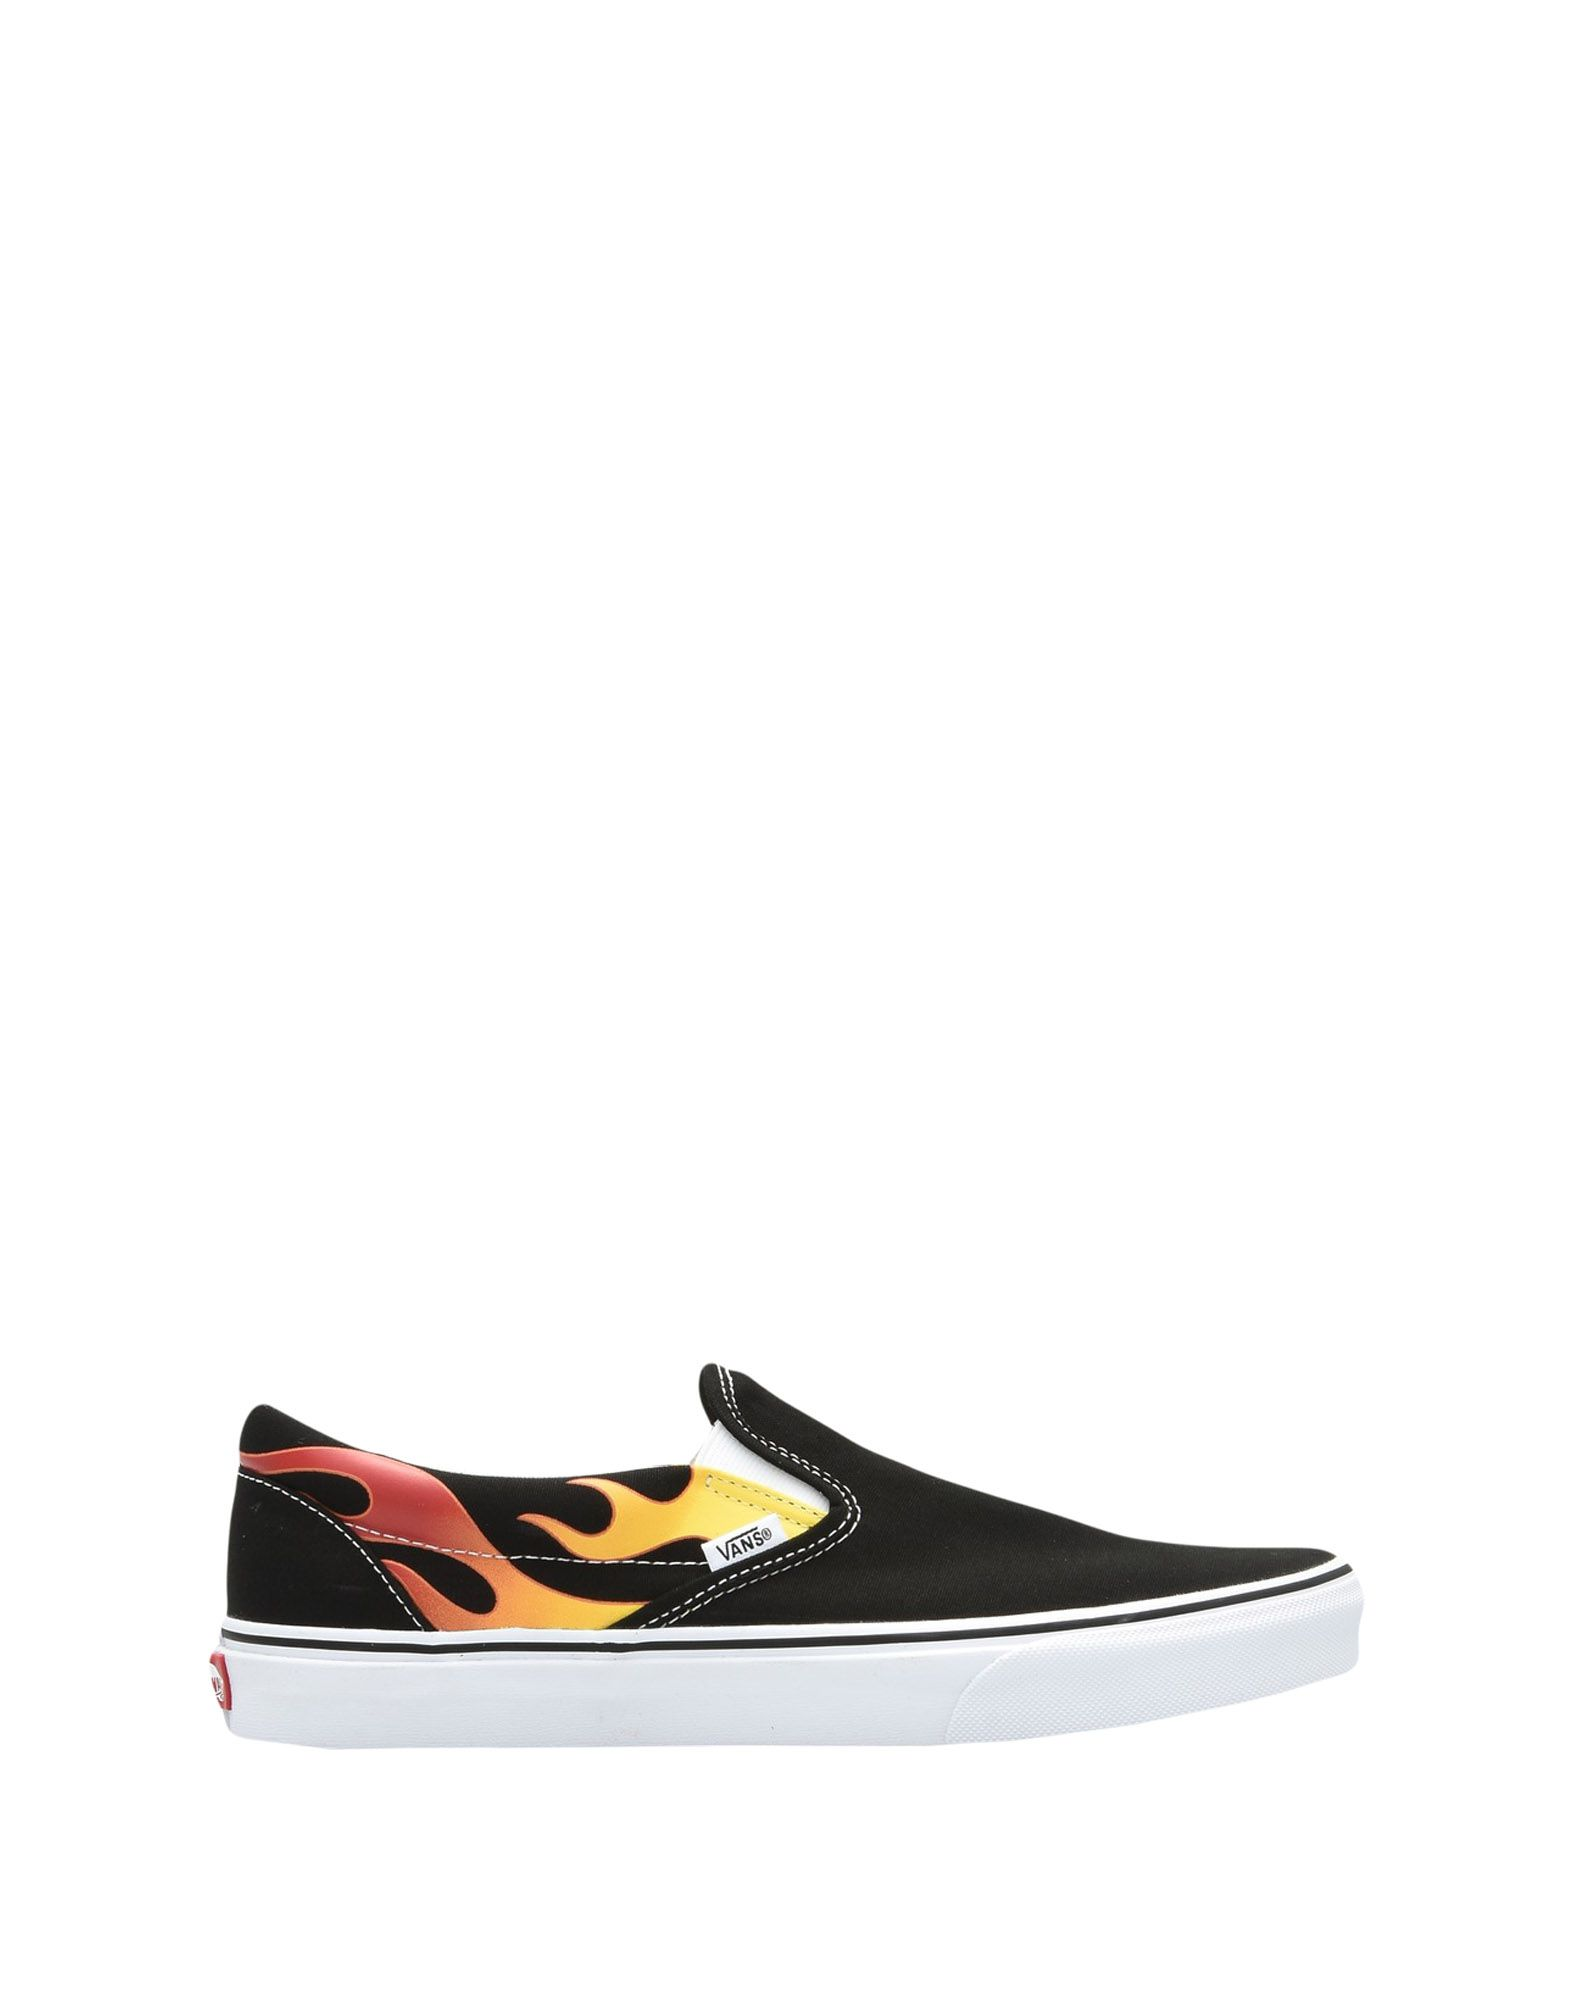 Vans Vans Vans Slip On Flames Pack  11496621HQ Neue Schuhe 1569bb